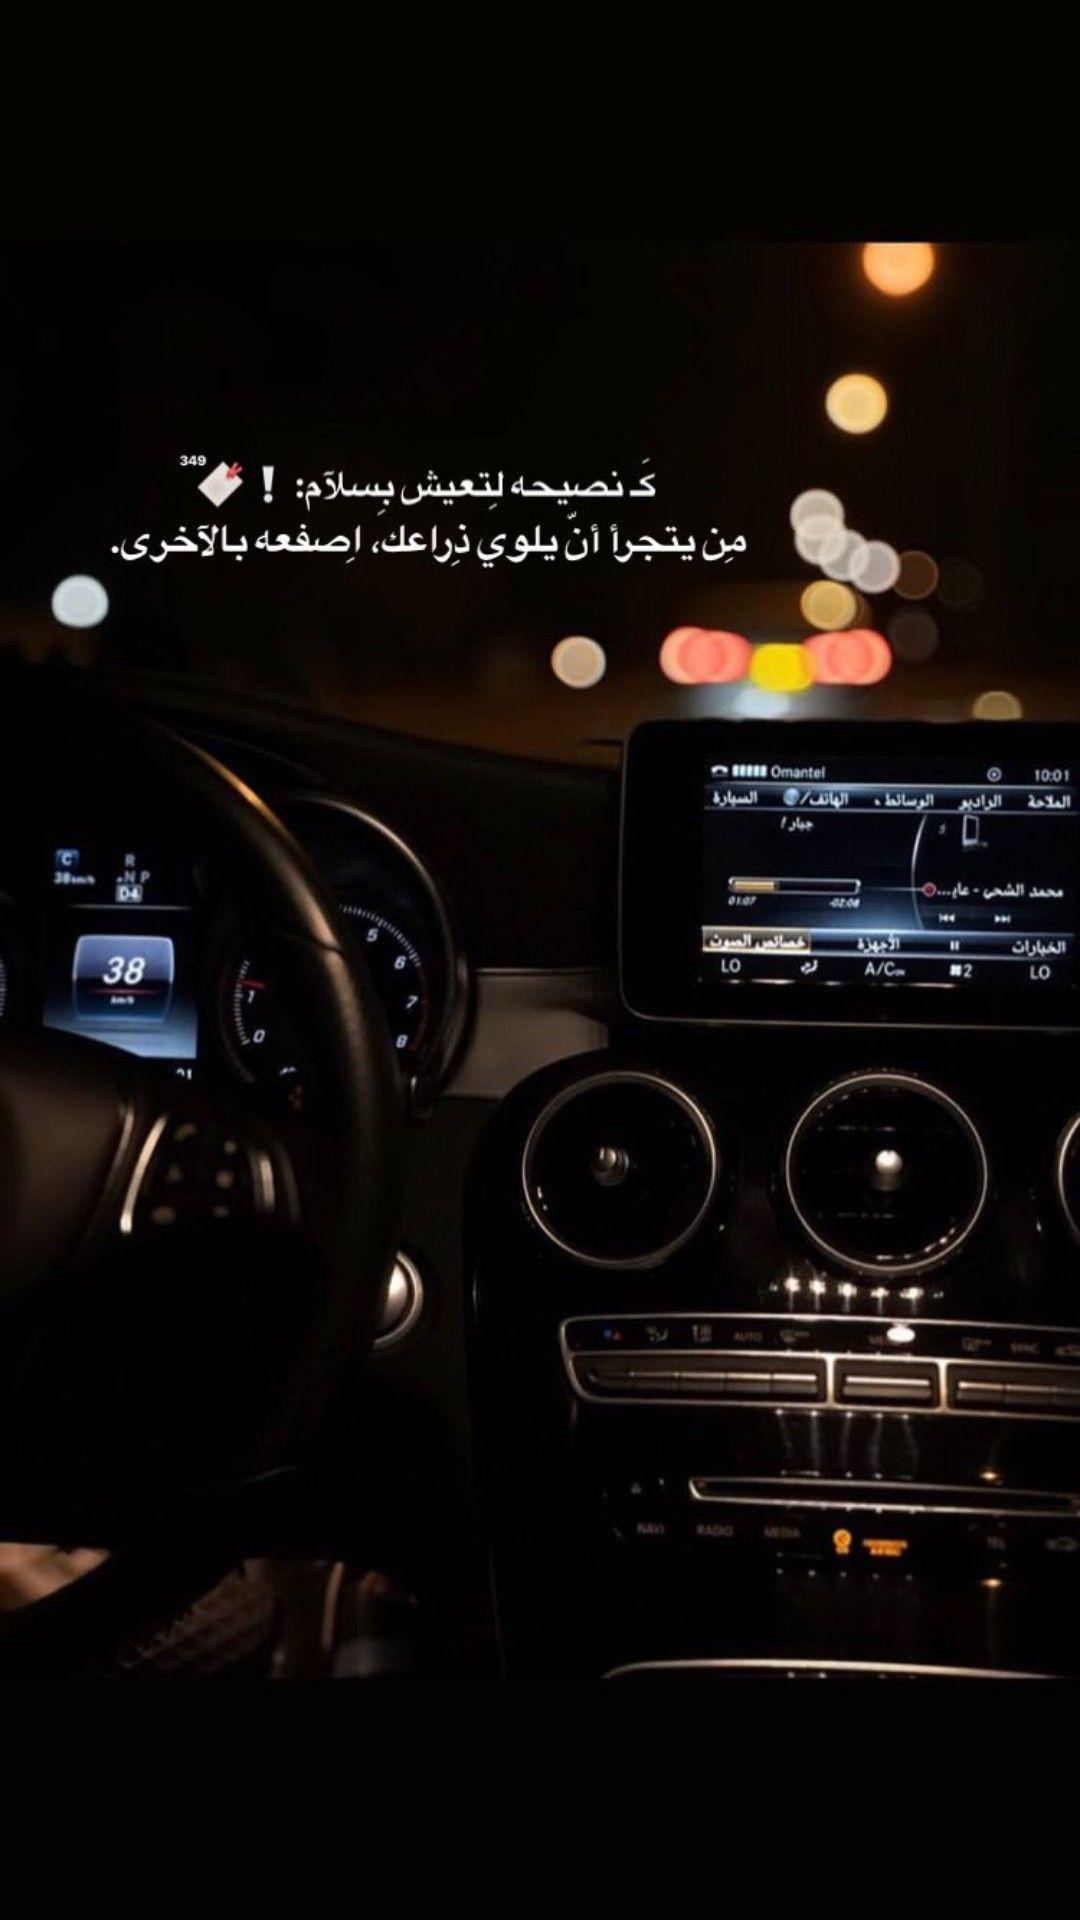 Diagnofast عالم السيارات الموقع الرائع الذي يشرح لنا أكواد أعطال السيارات Vehicle Gauge